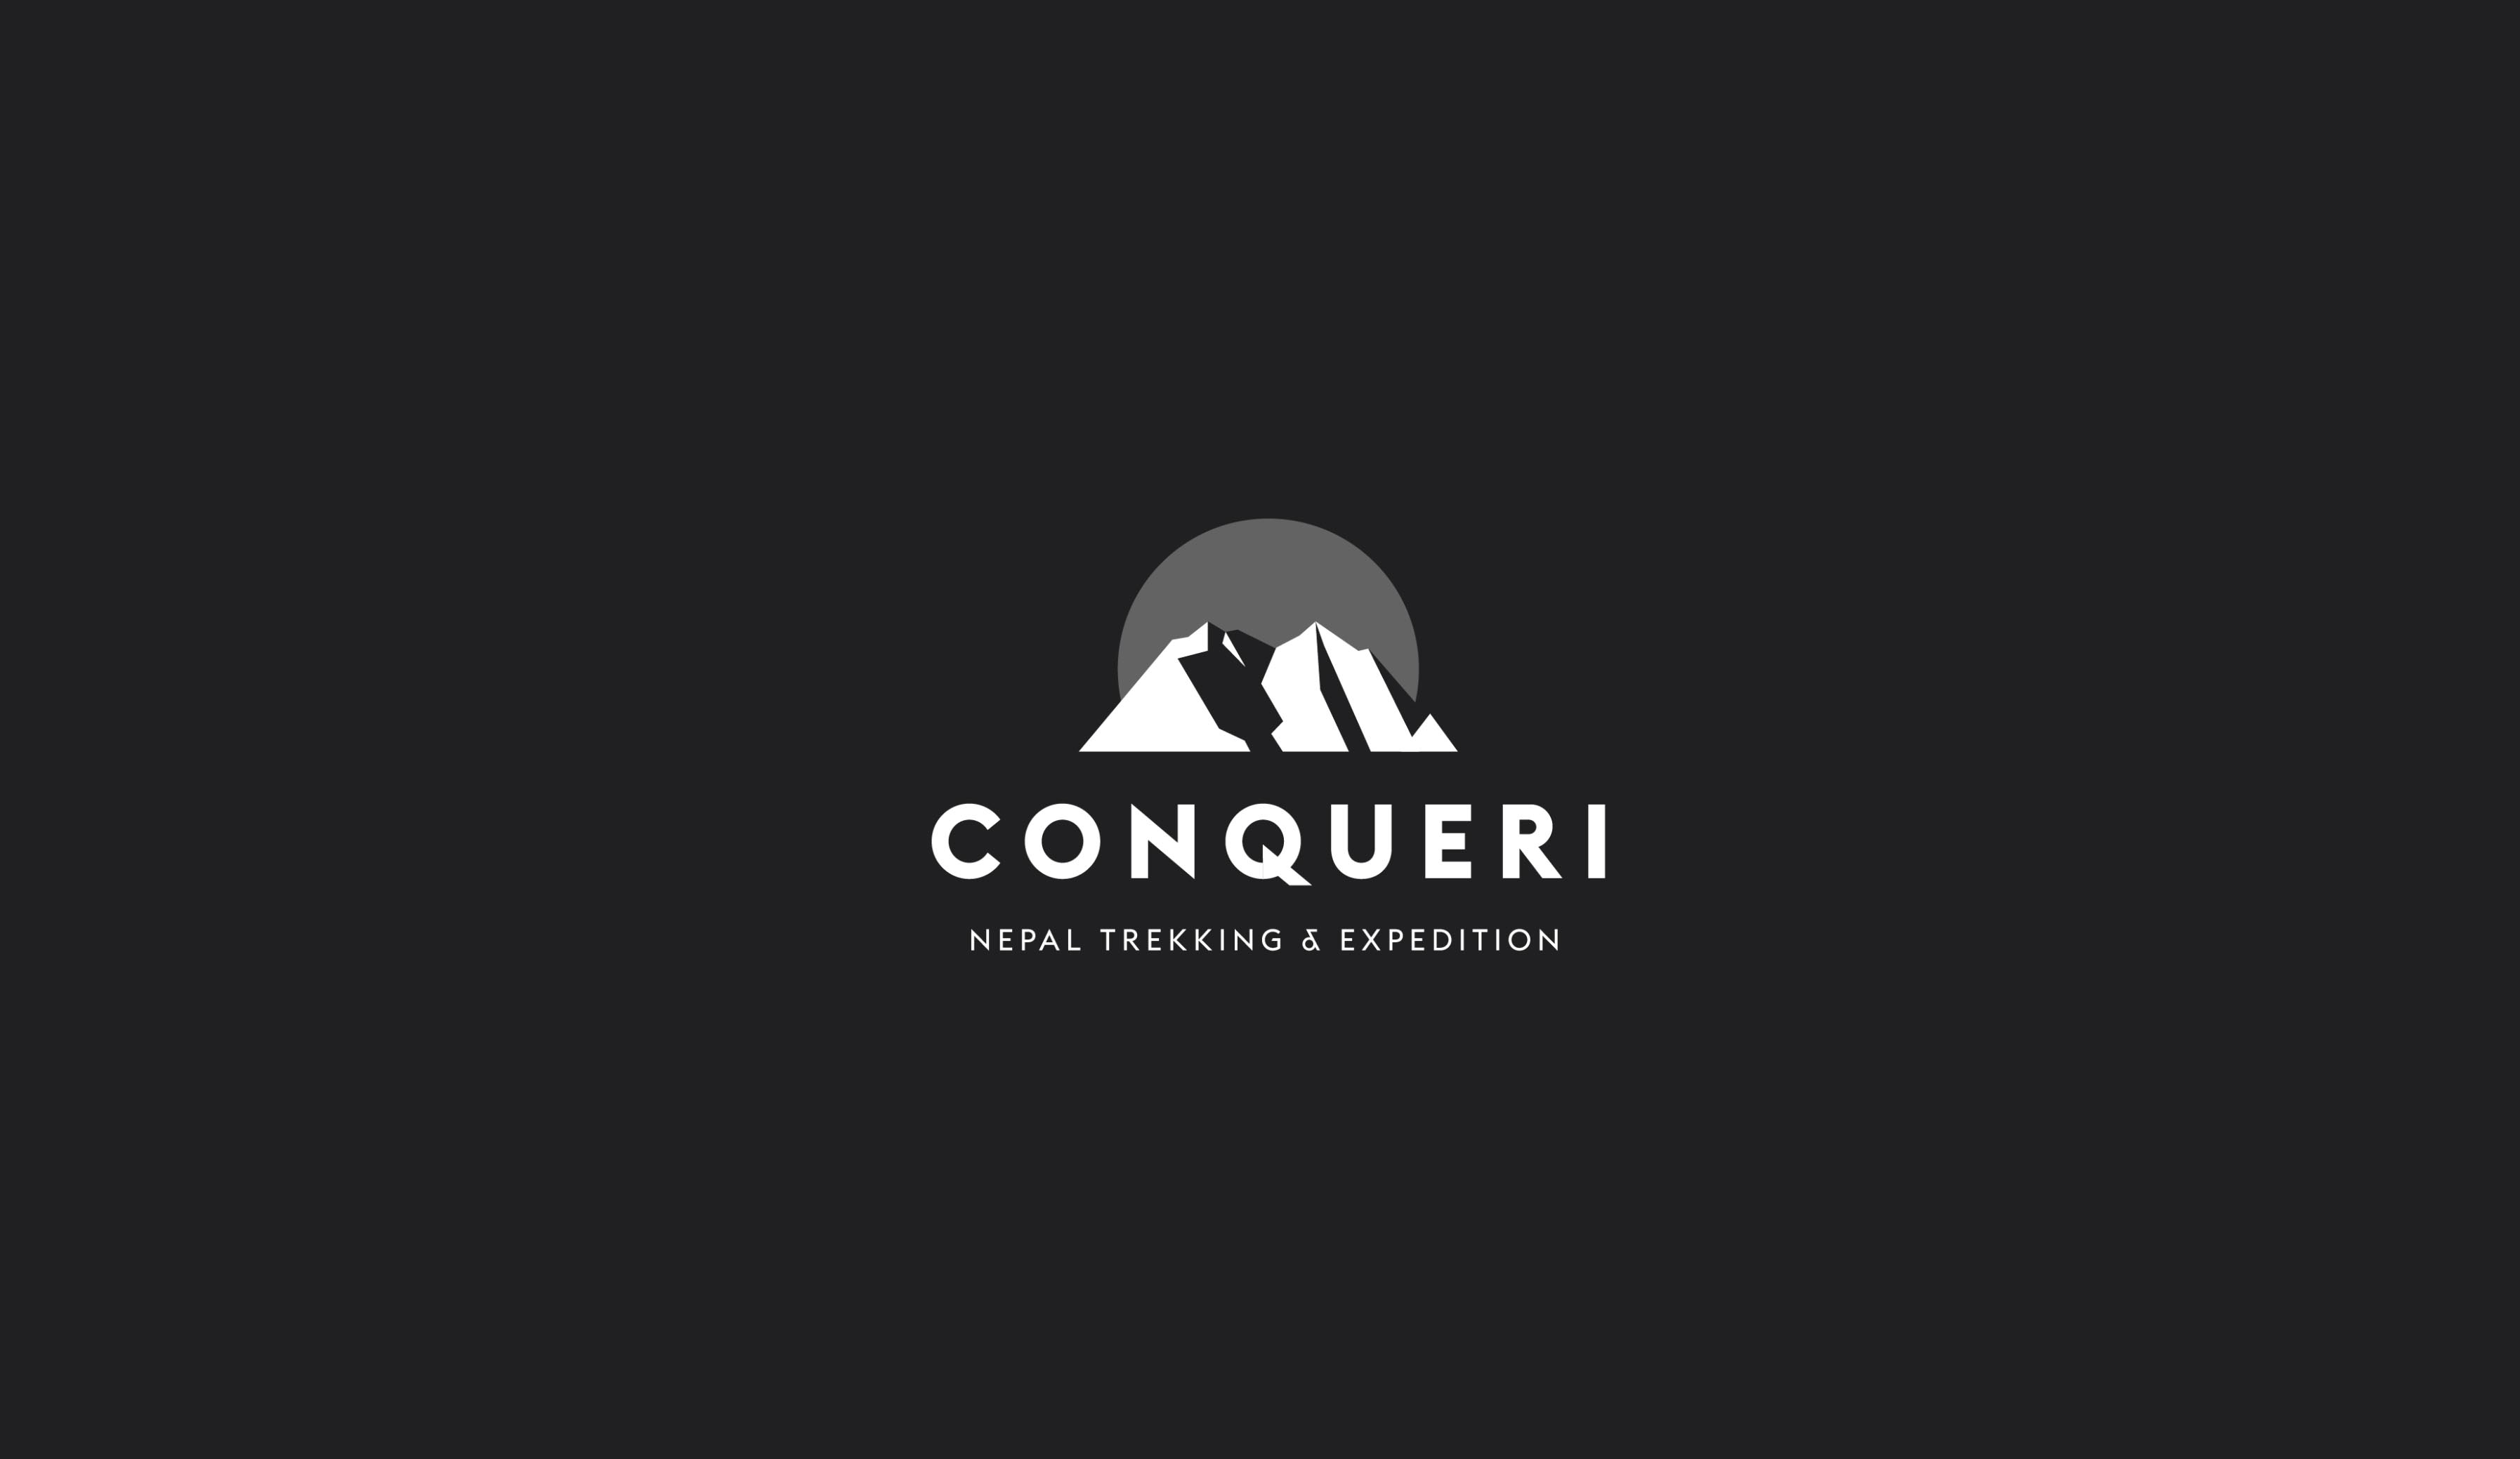 Nepal trekking company logo design